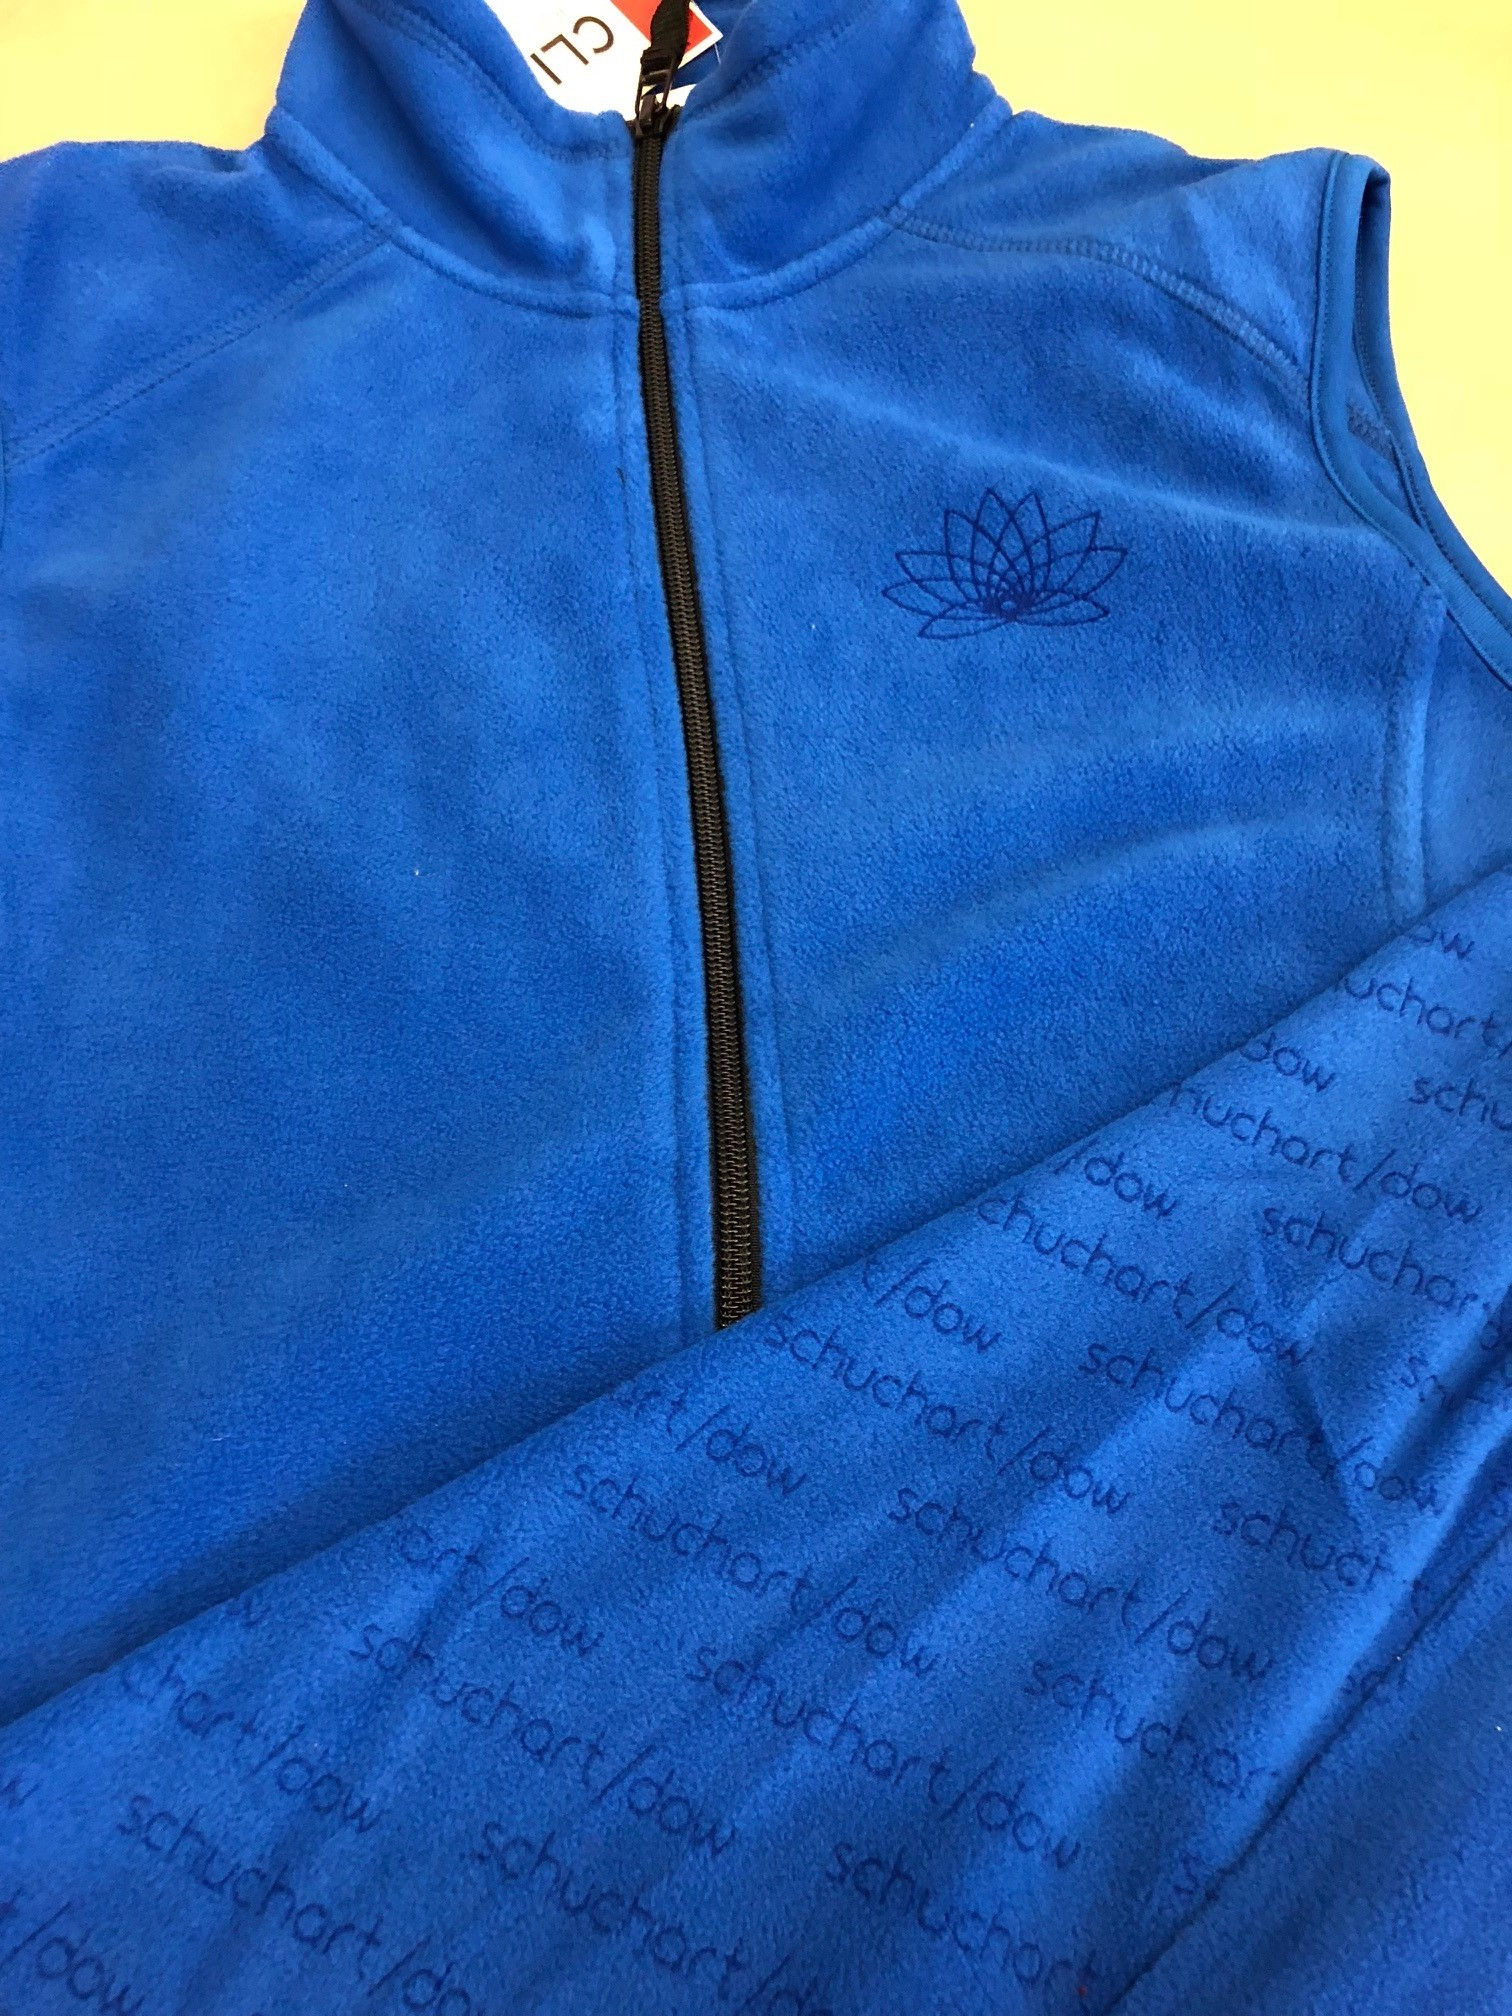 logounltd_laser_etching_embroidery_screen_printing_apparel_uniform_custom_tshirts_dye_sublimation_kirkland_bellevue_seattle_redmond_branded_merchandise_promotional_products_logo_unltd_dow_ (1).jpg